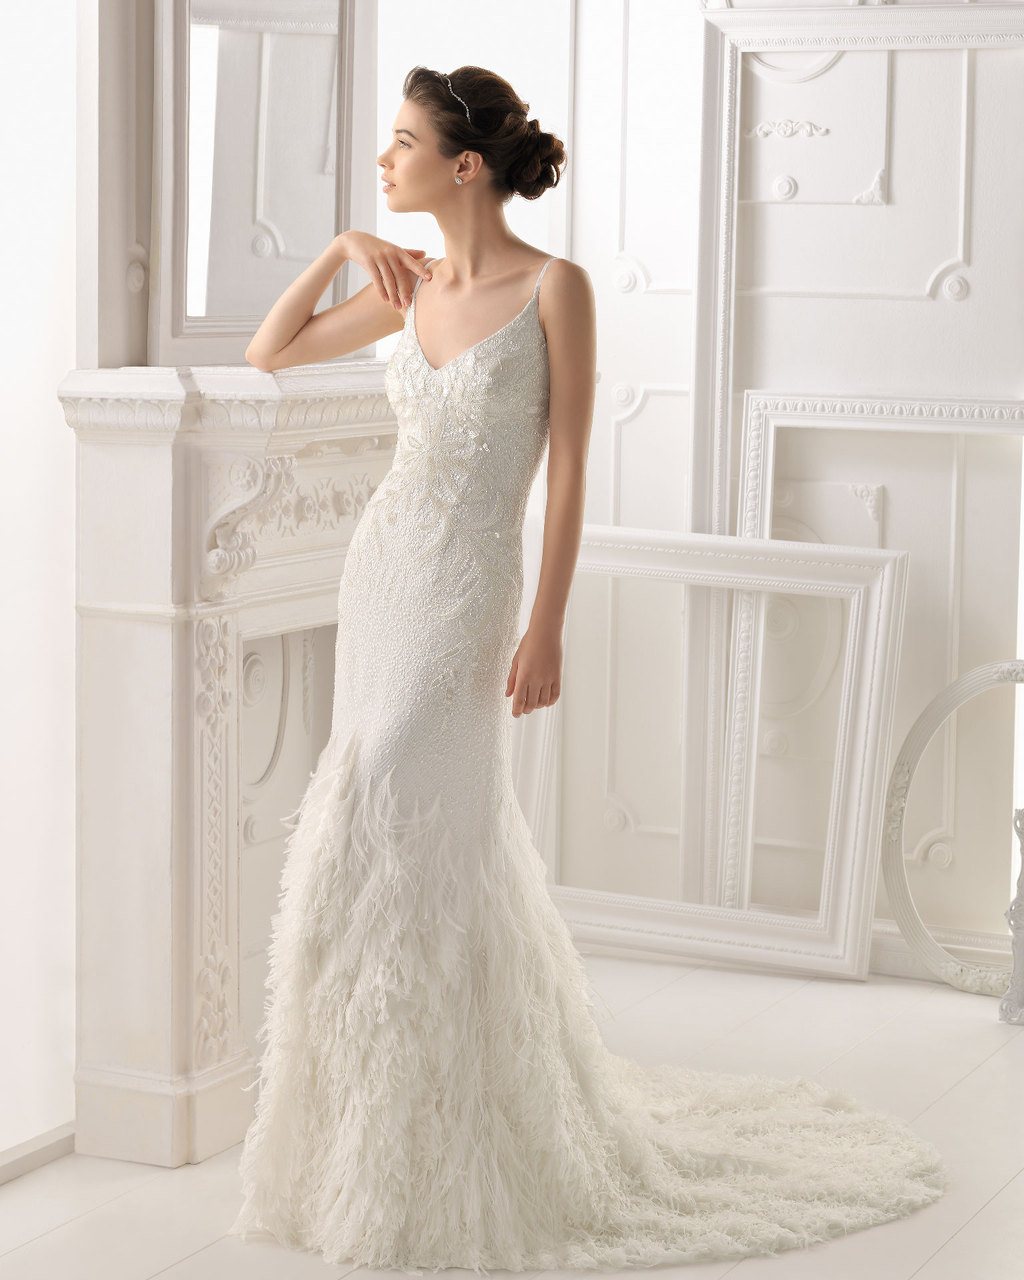 Aire-barcelona-wedding-dress-2014-bridal-ondara.full